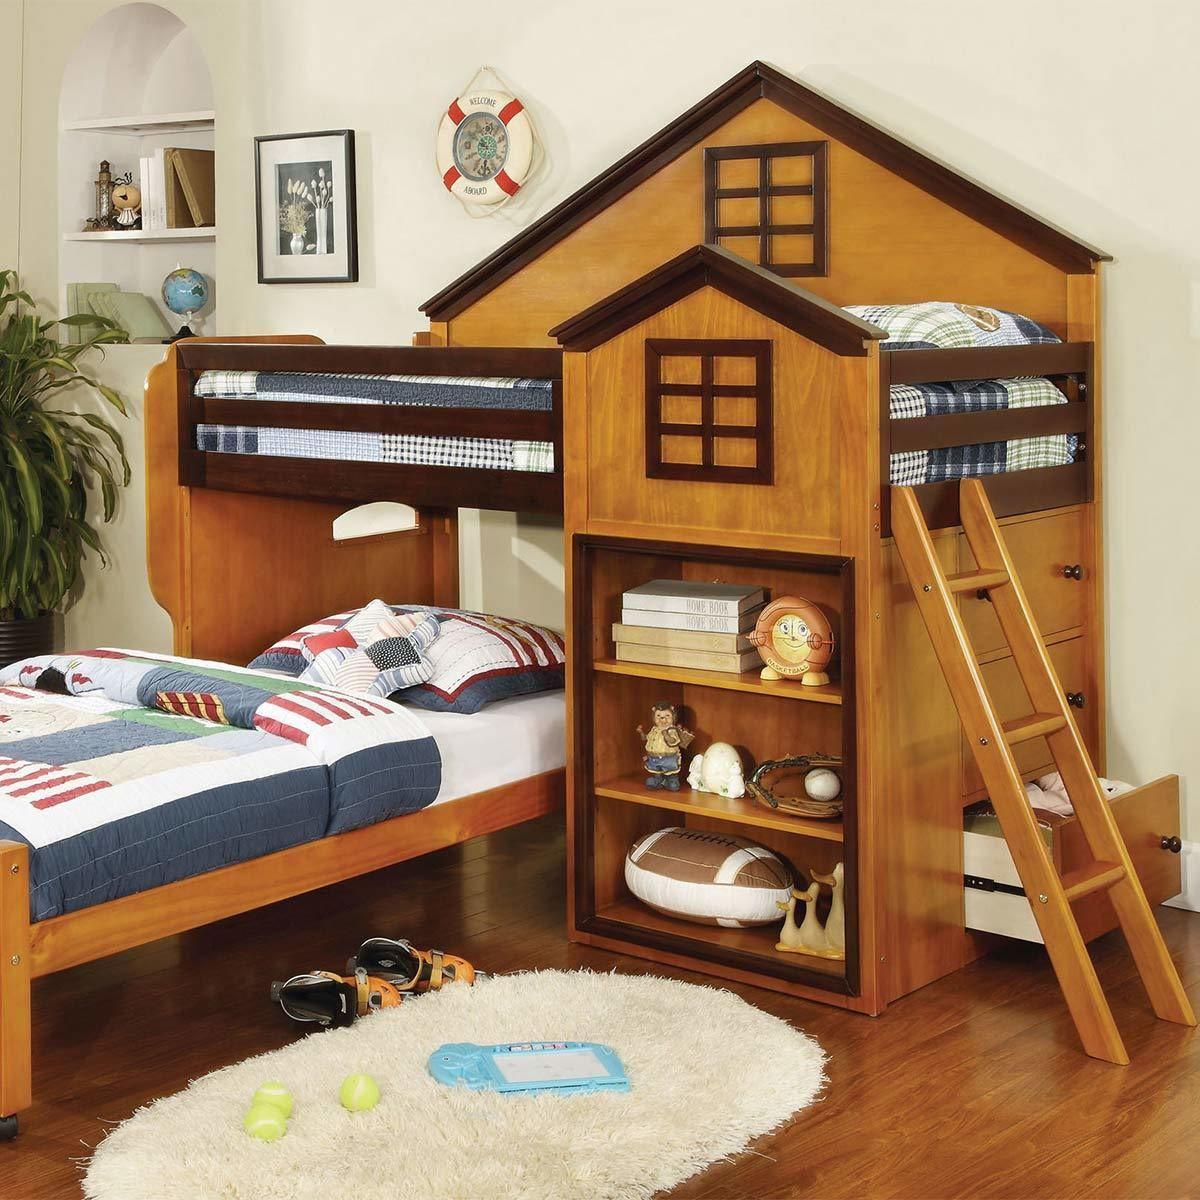 55 Bunk Beds Under 300 Interior Design Ideas For Bedroom Check